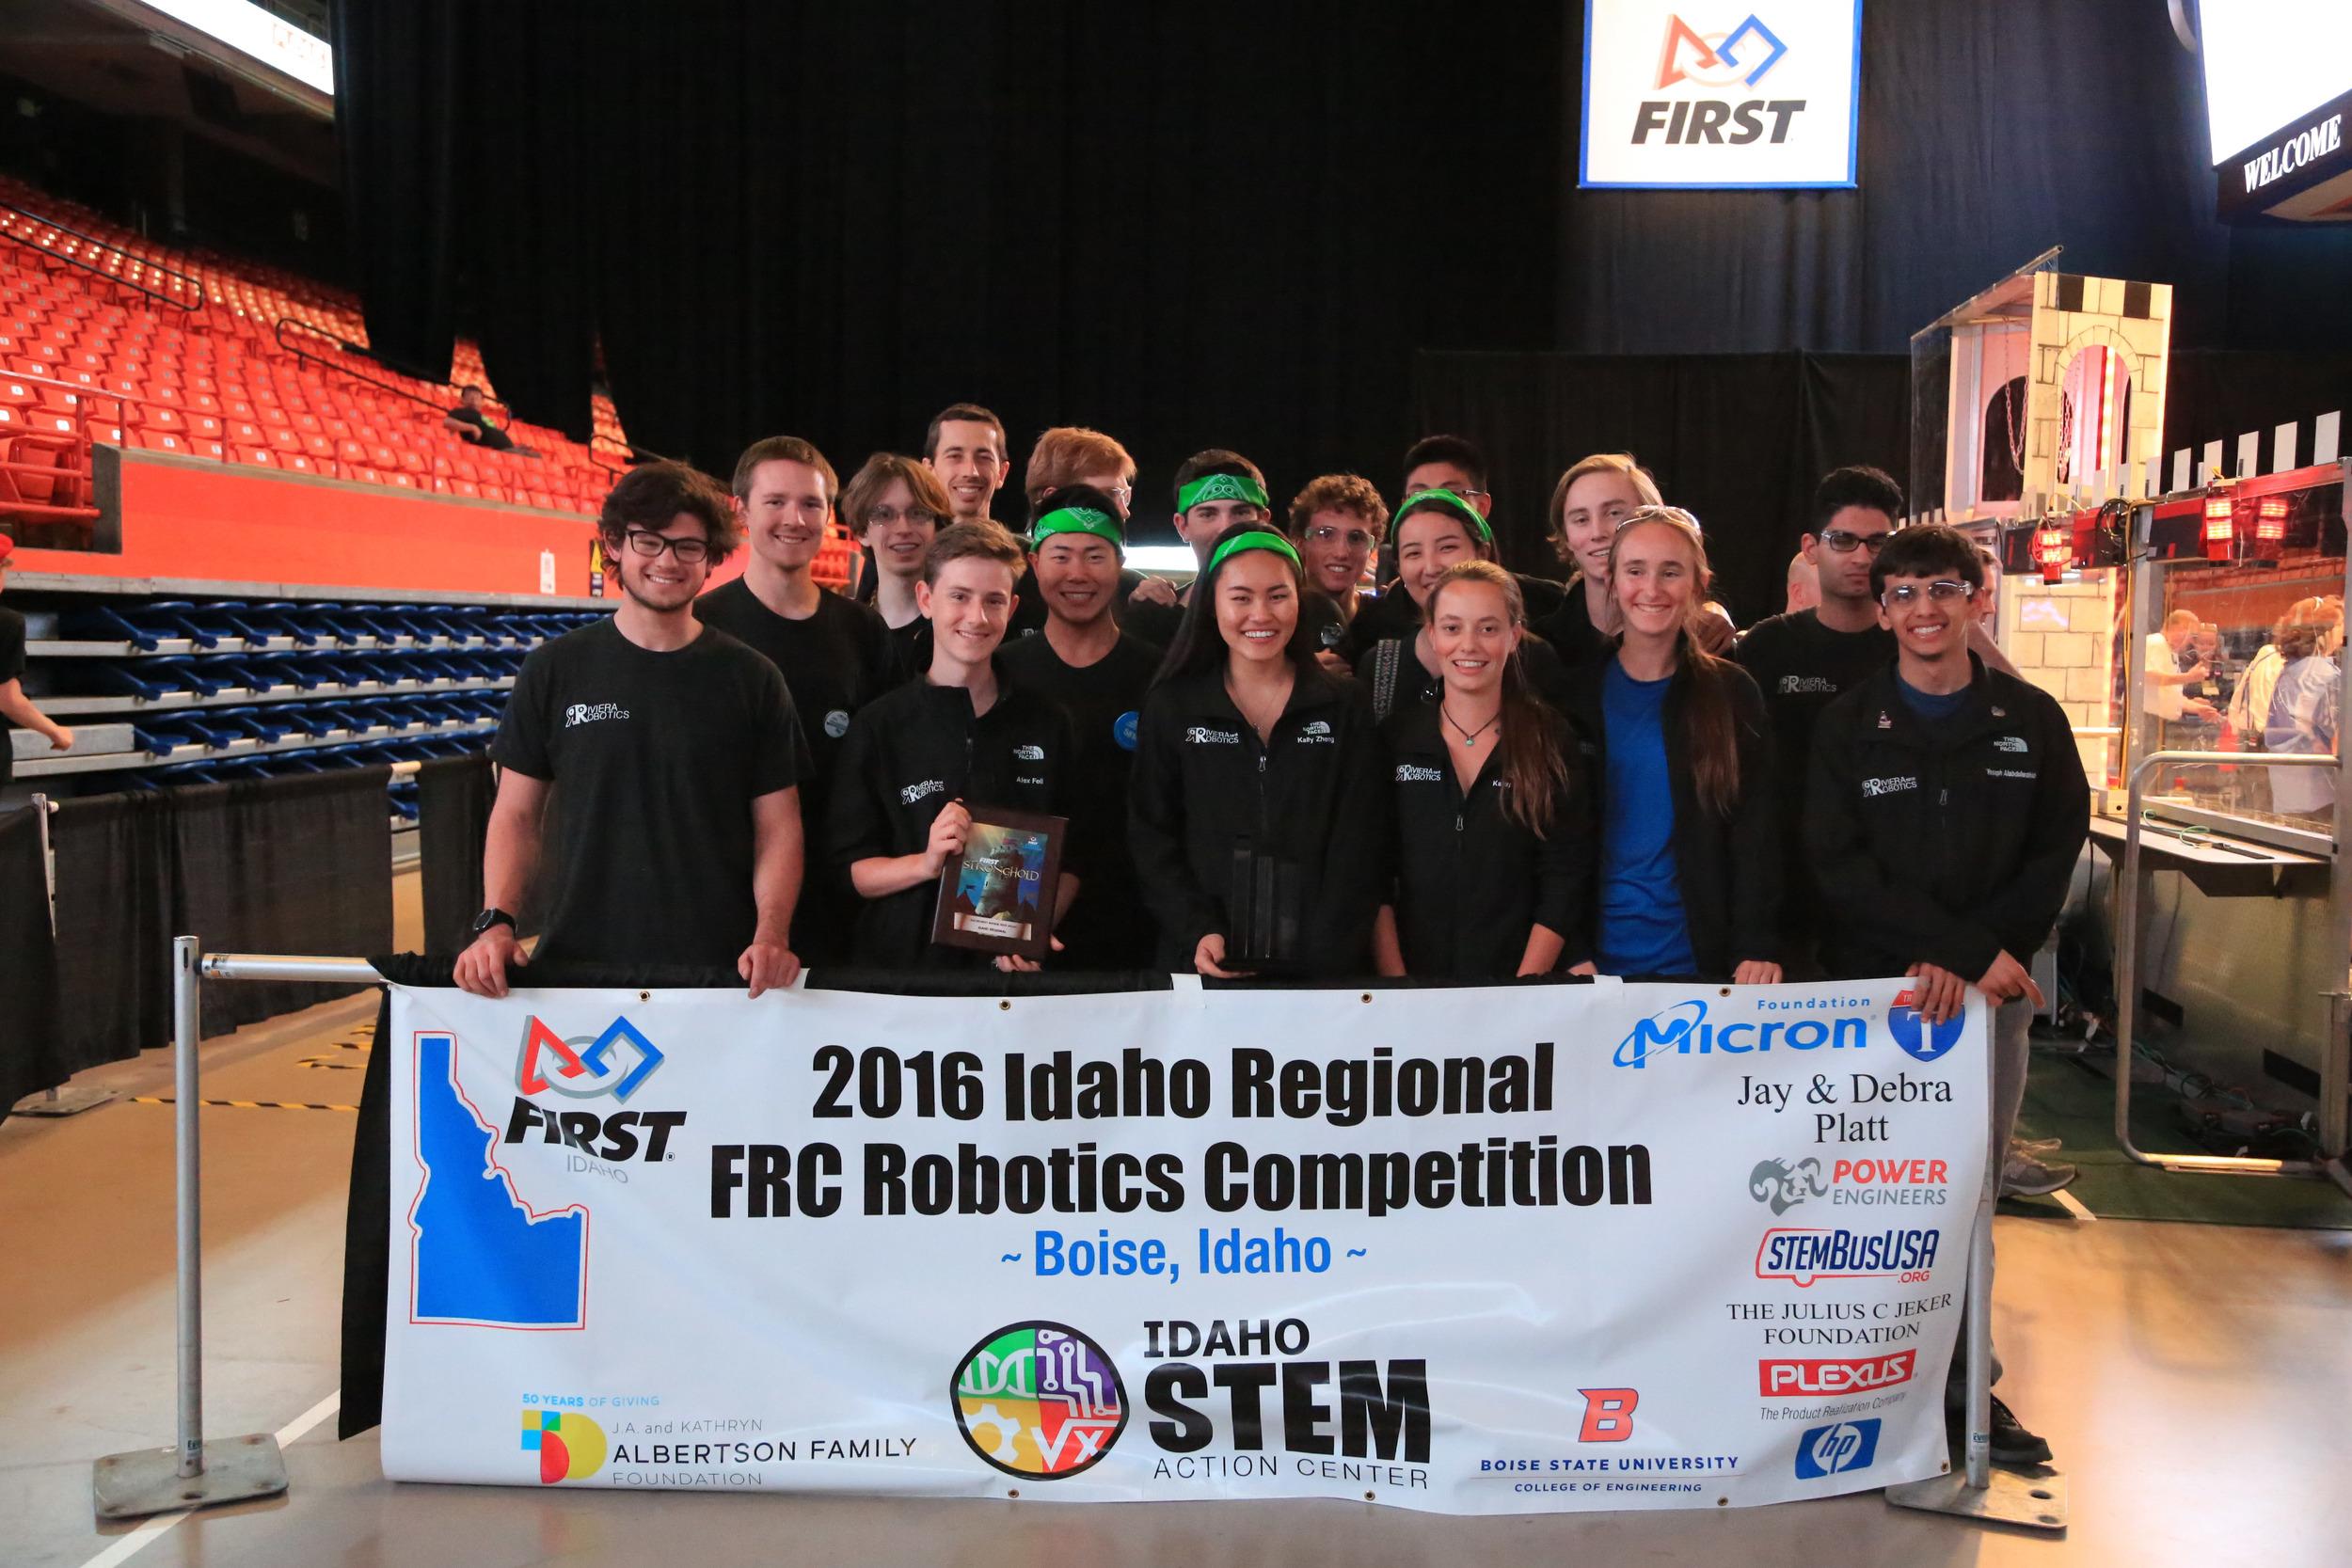 Team 5818 after winning the FRC Idaho Regional Rookie All-Star Award